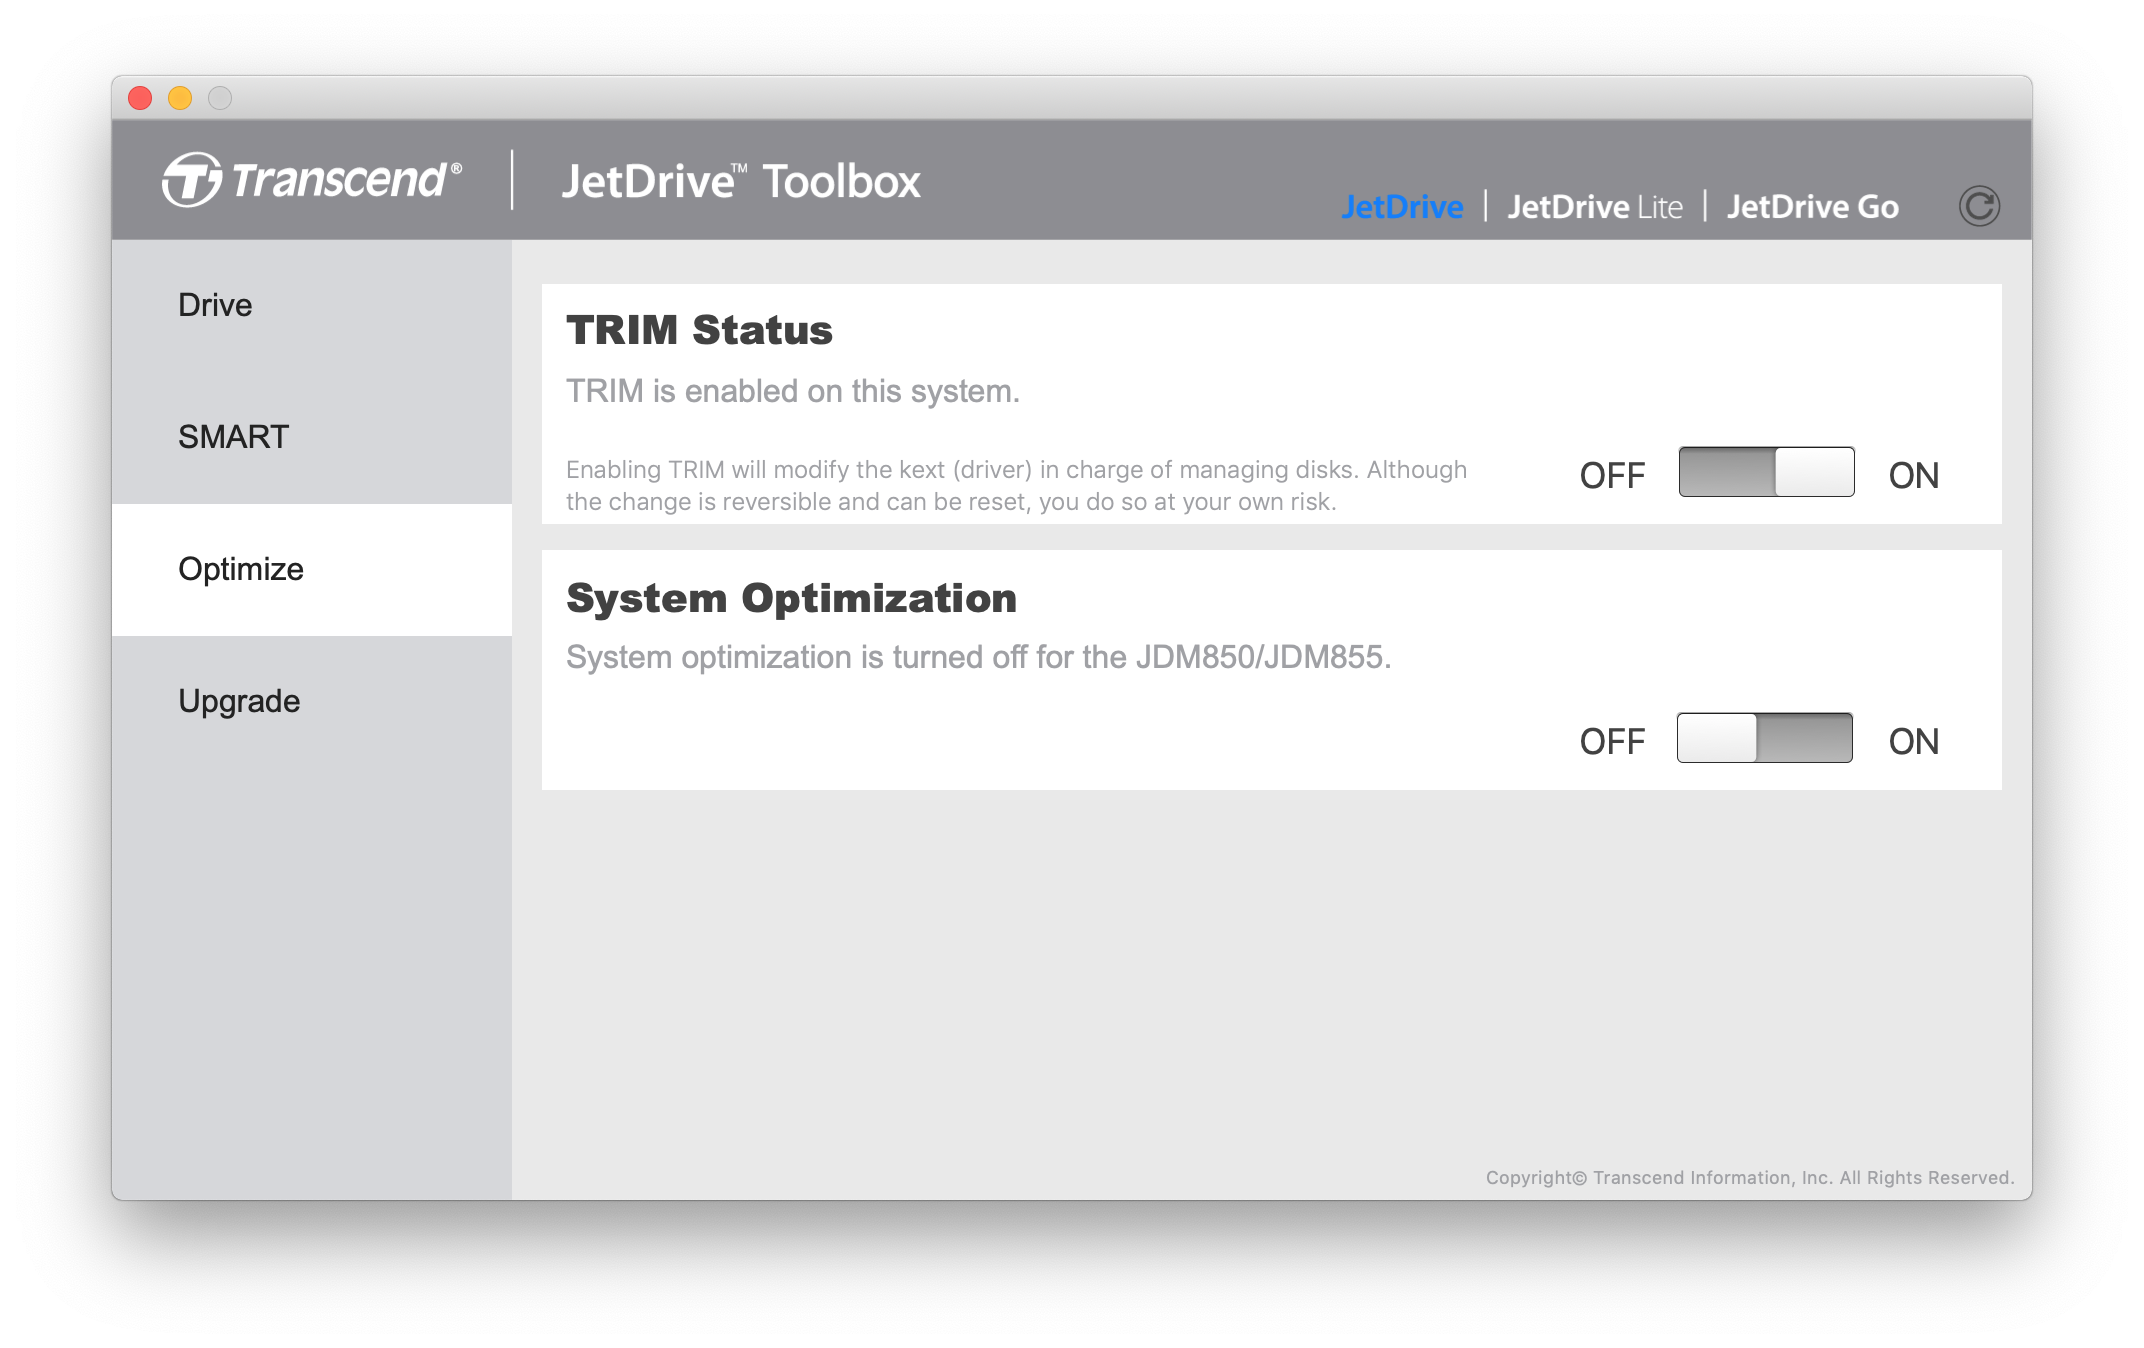 JetDrive Toolbox - Support & Download